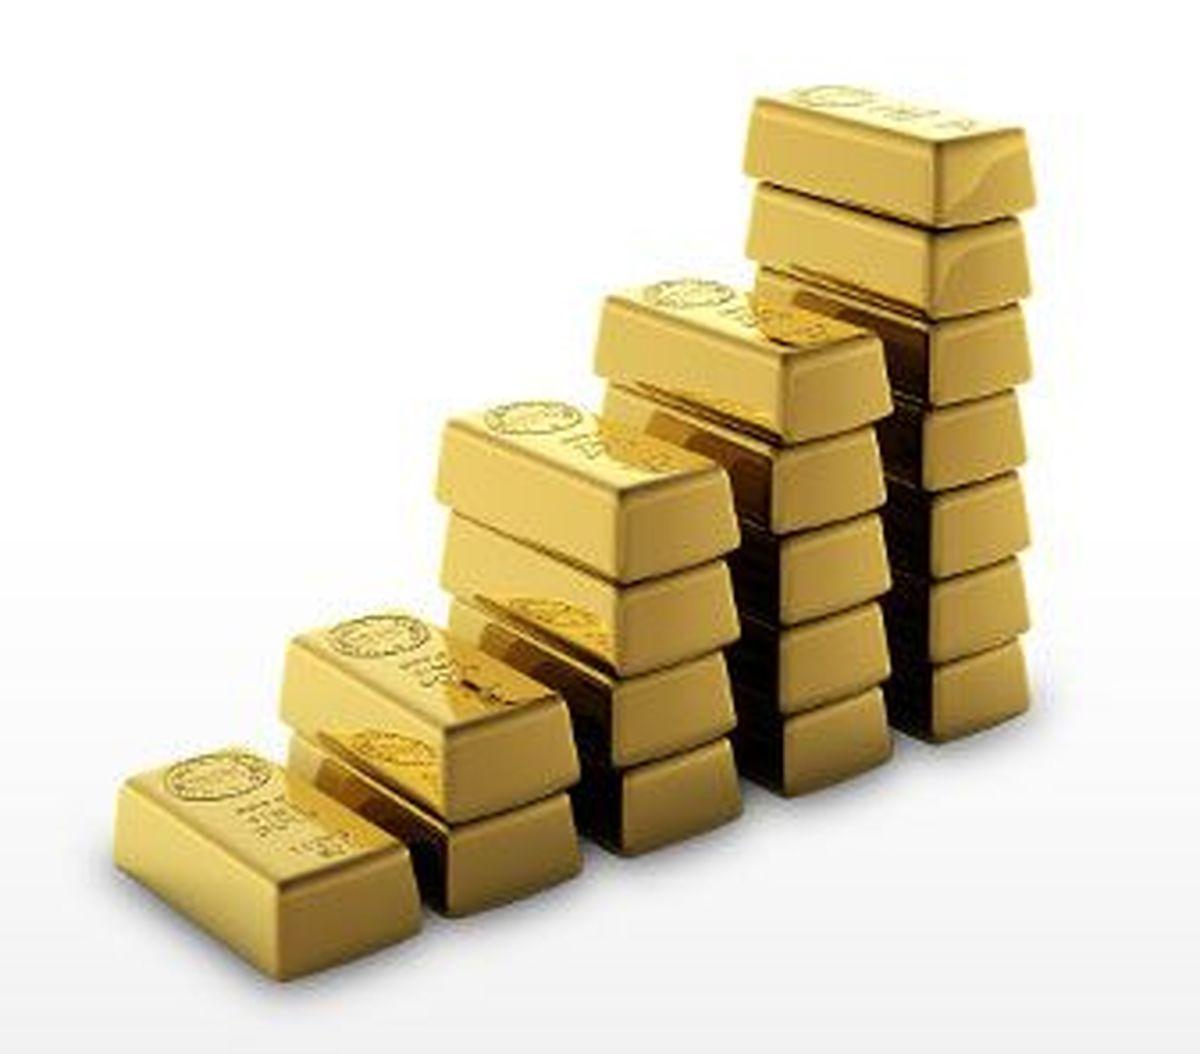 کاهش 4 دلاری قیمت طلا